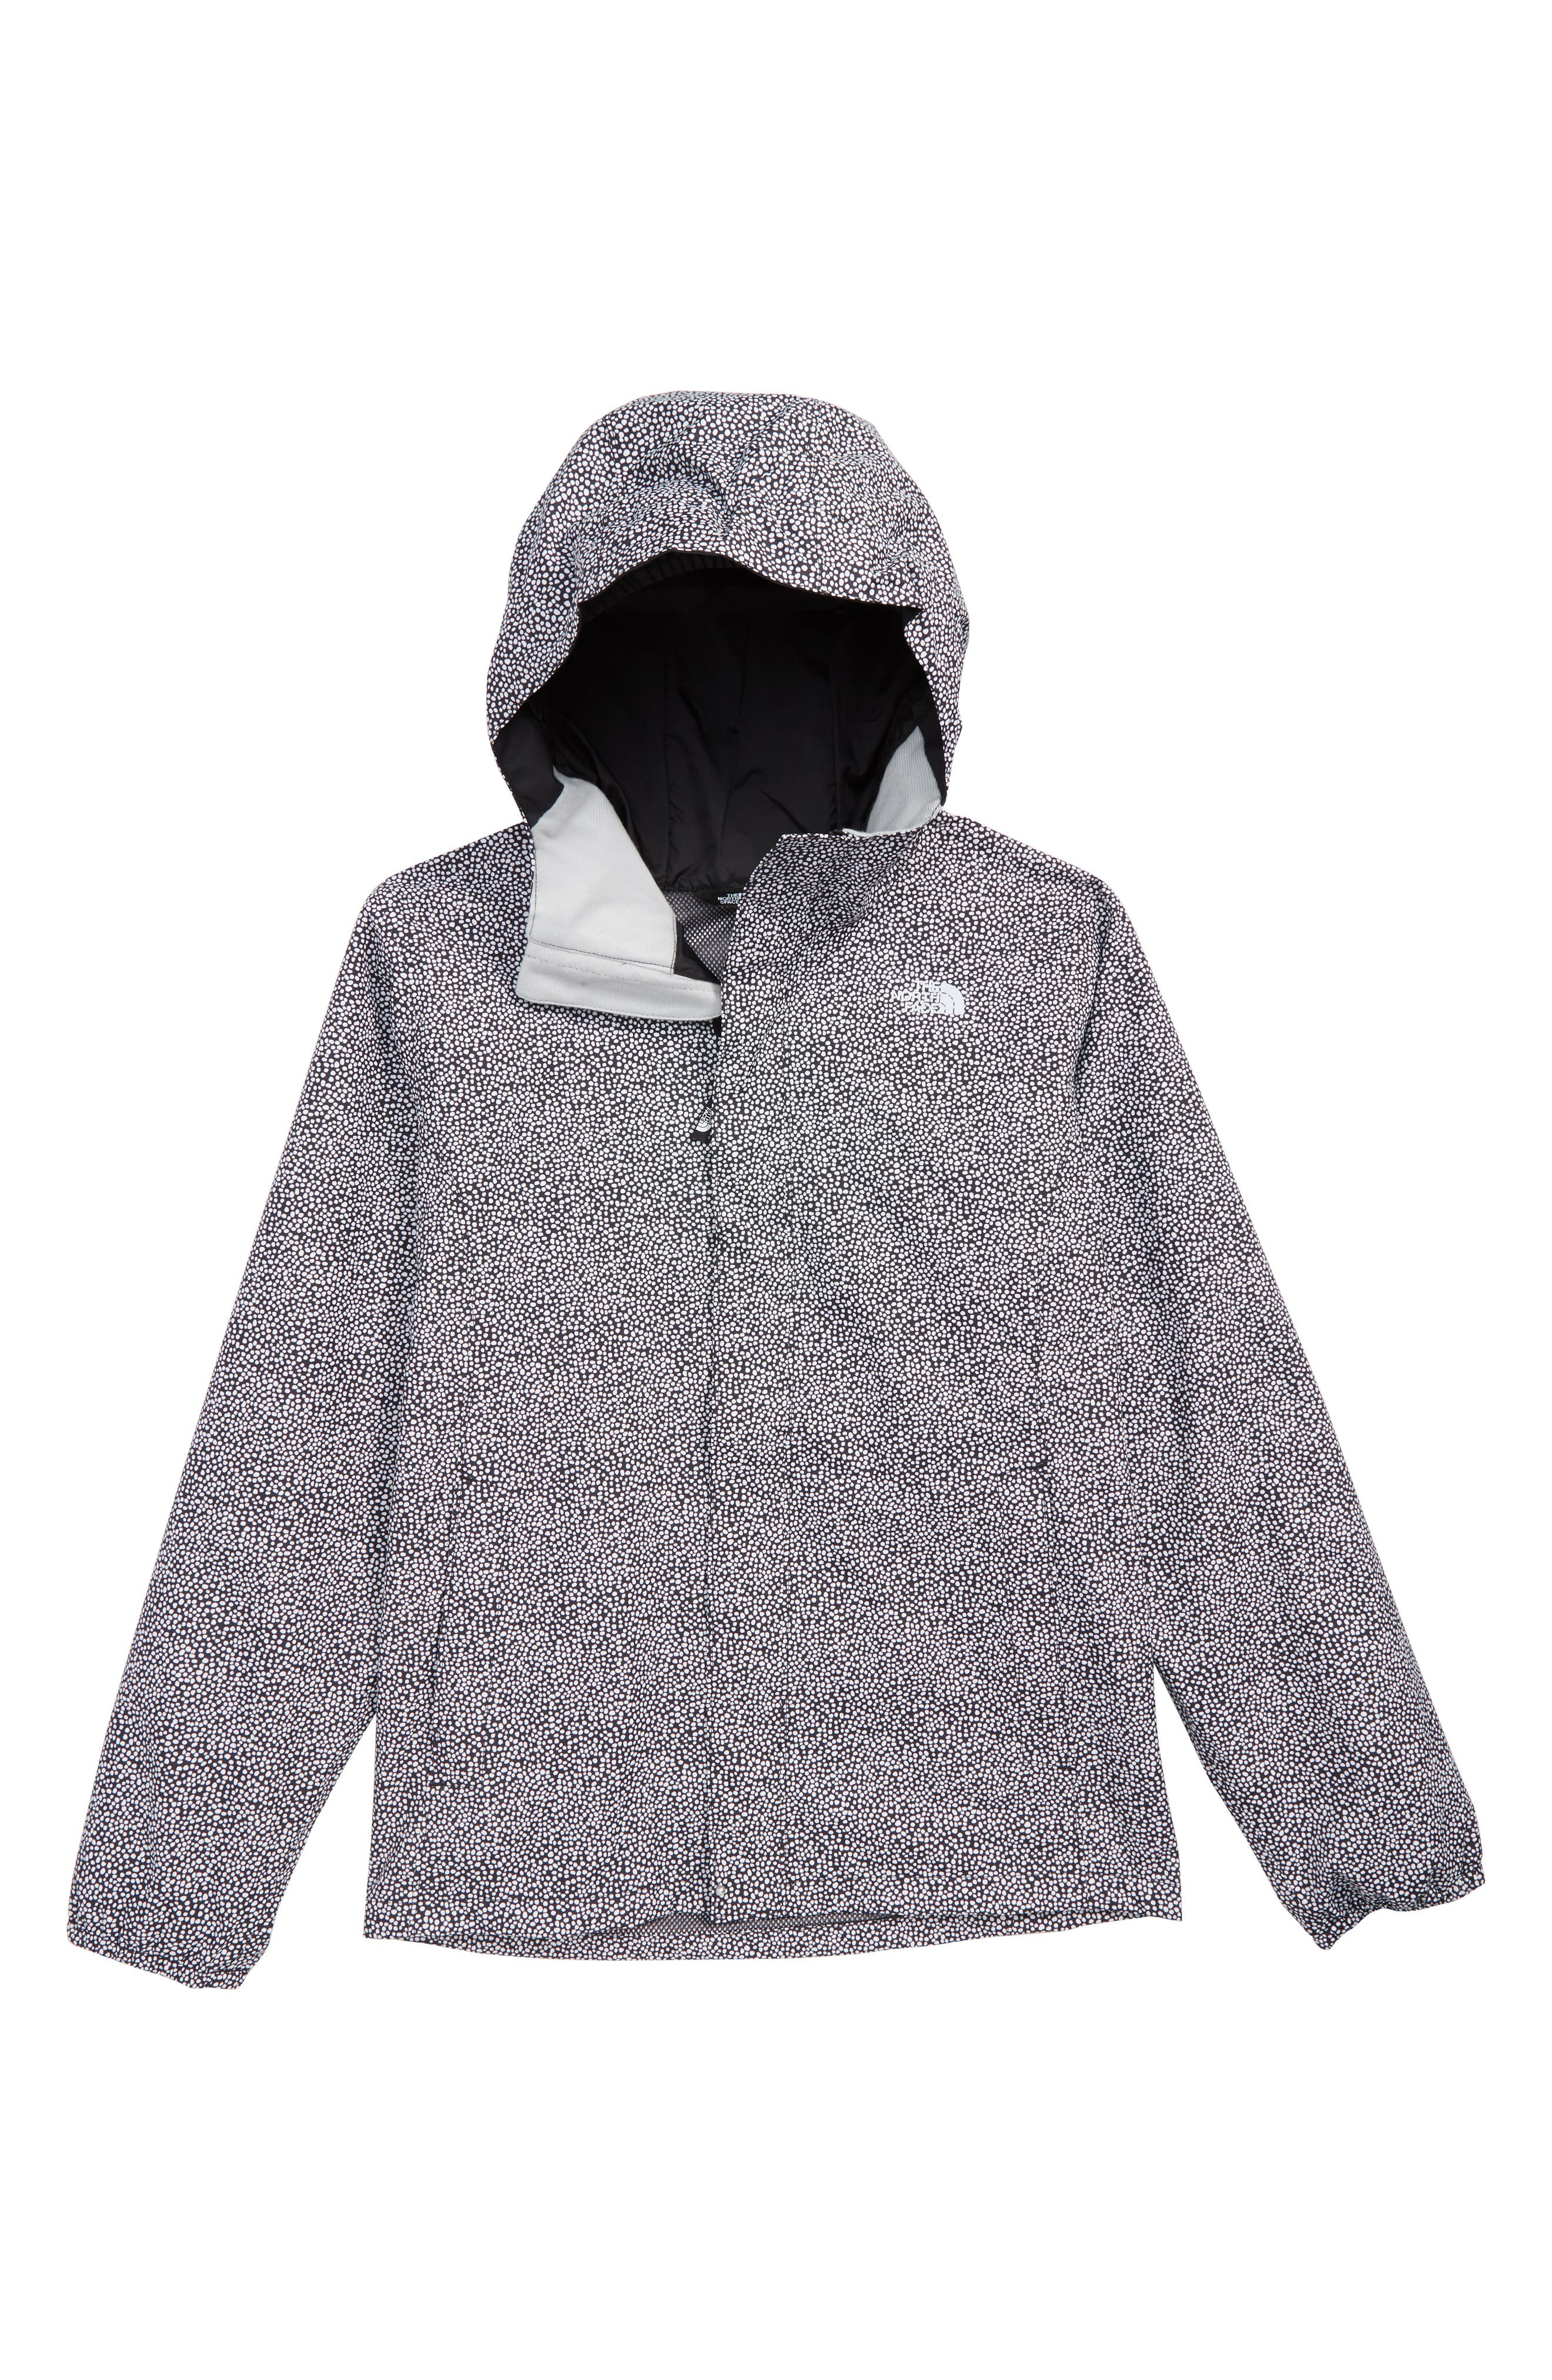 THE NORTH FACE, Resolve Reflective Waterproof Jacket, Main thumbnail 1, color, TNF WHITE MINI DOT PRINT